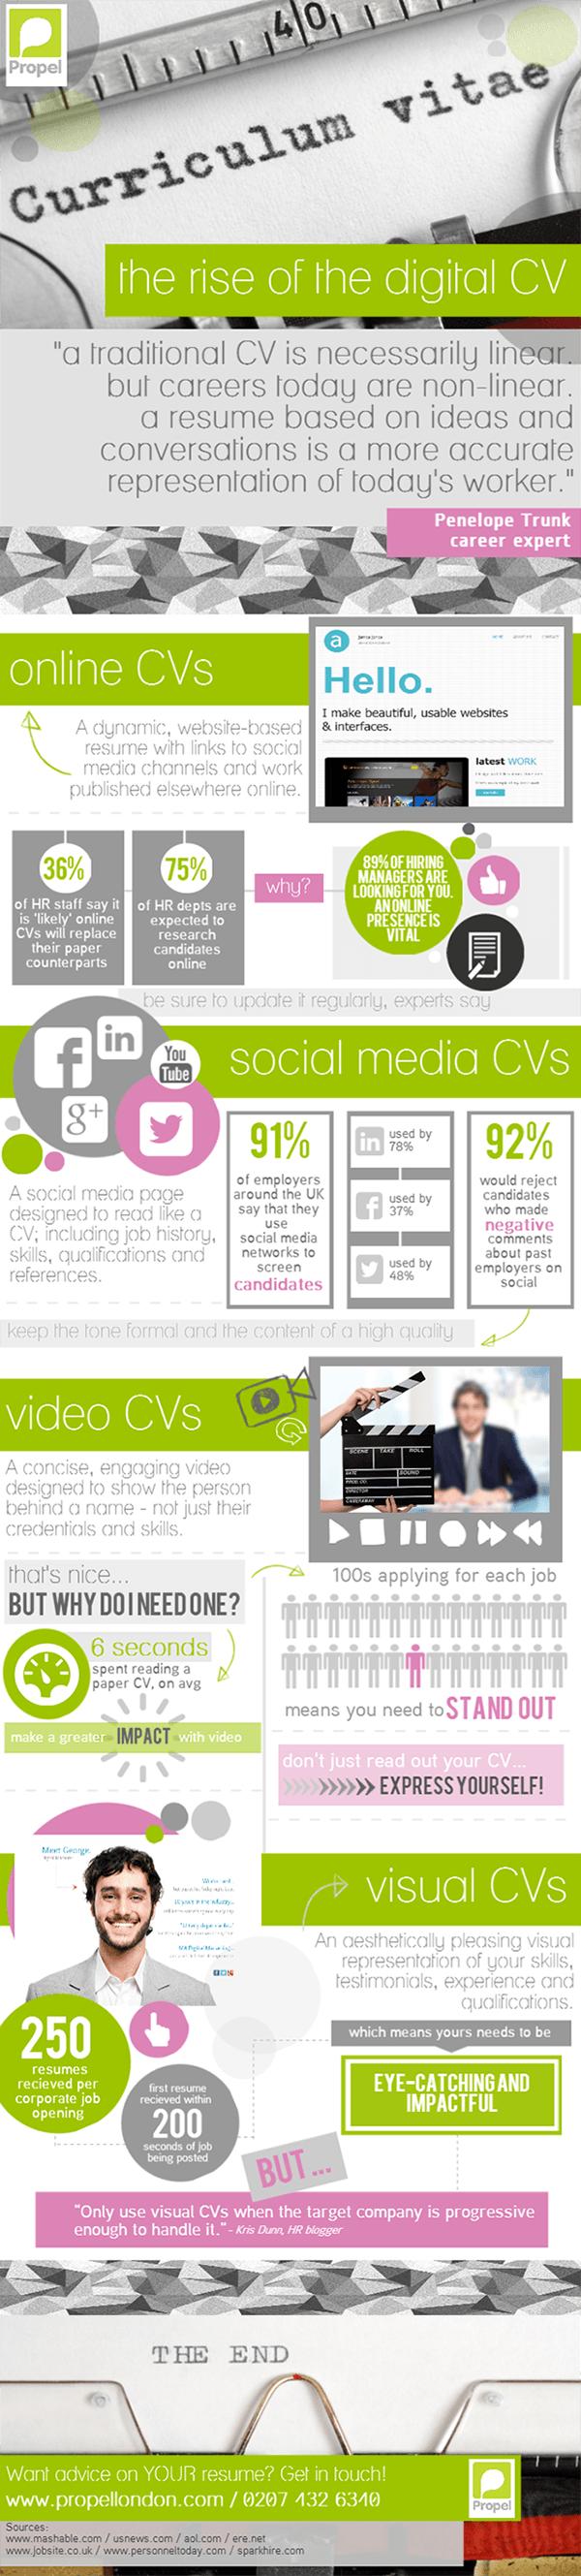 Digital Resume digital marketing intern resume samples The Rise Of The Digital Cv Infographic